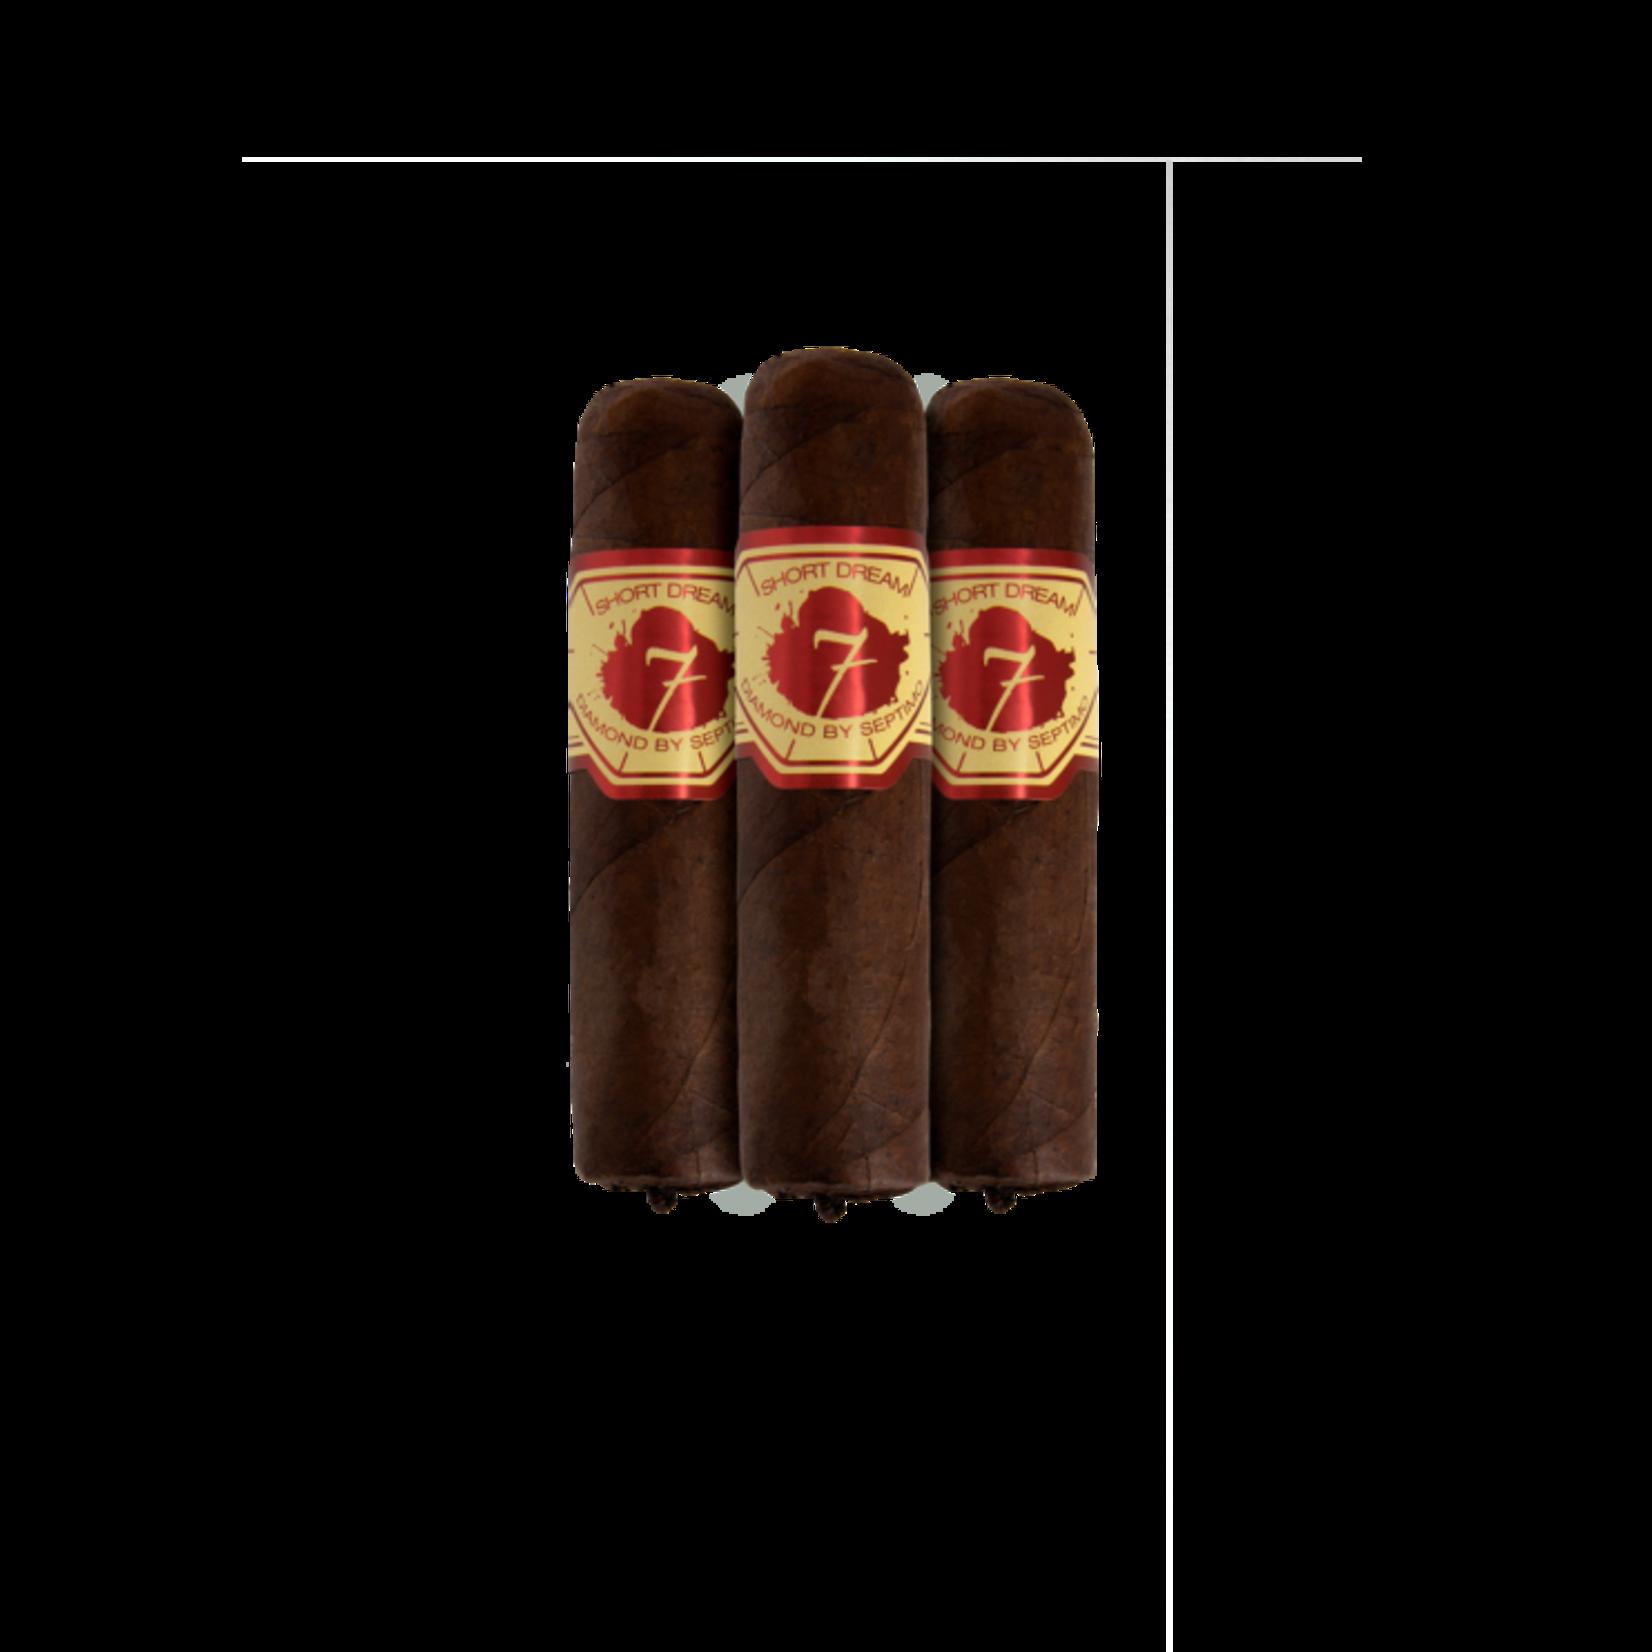 El Septimo Cigars Short Dream Topaz